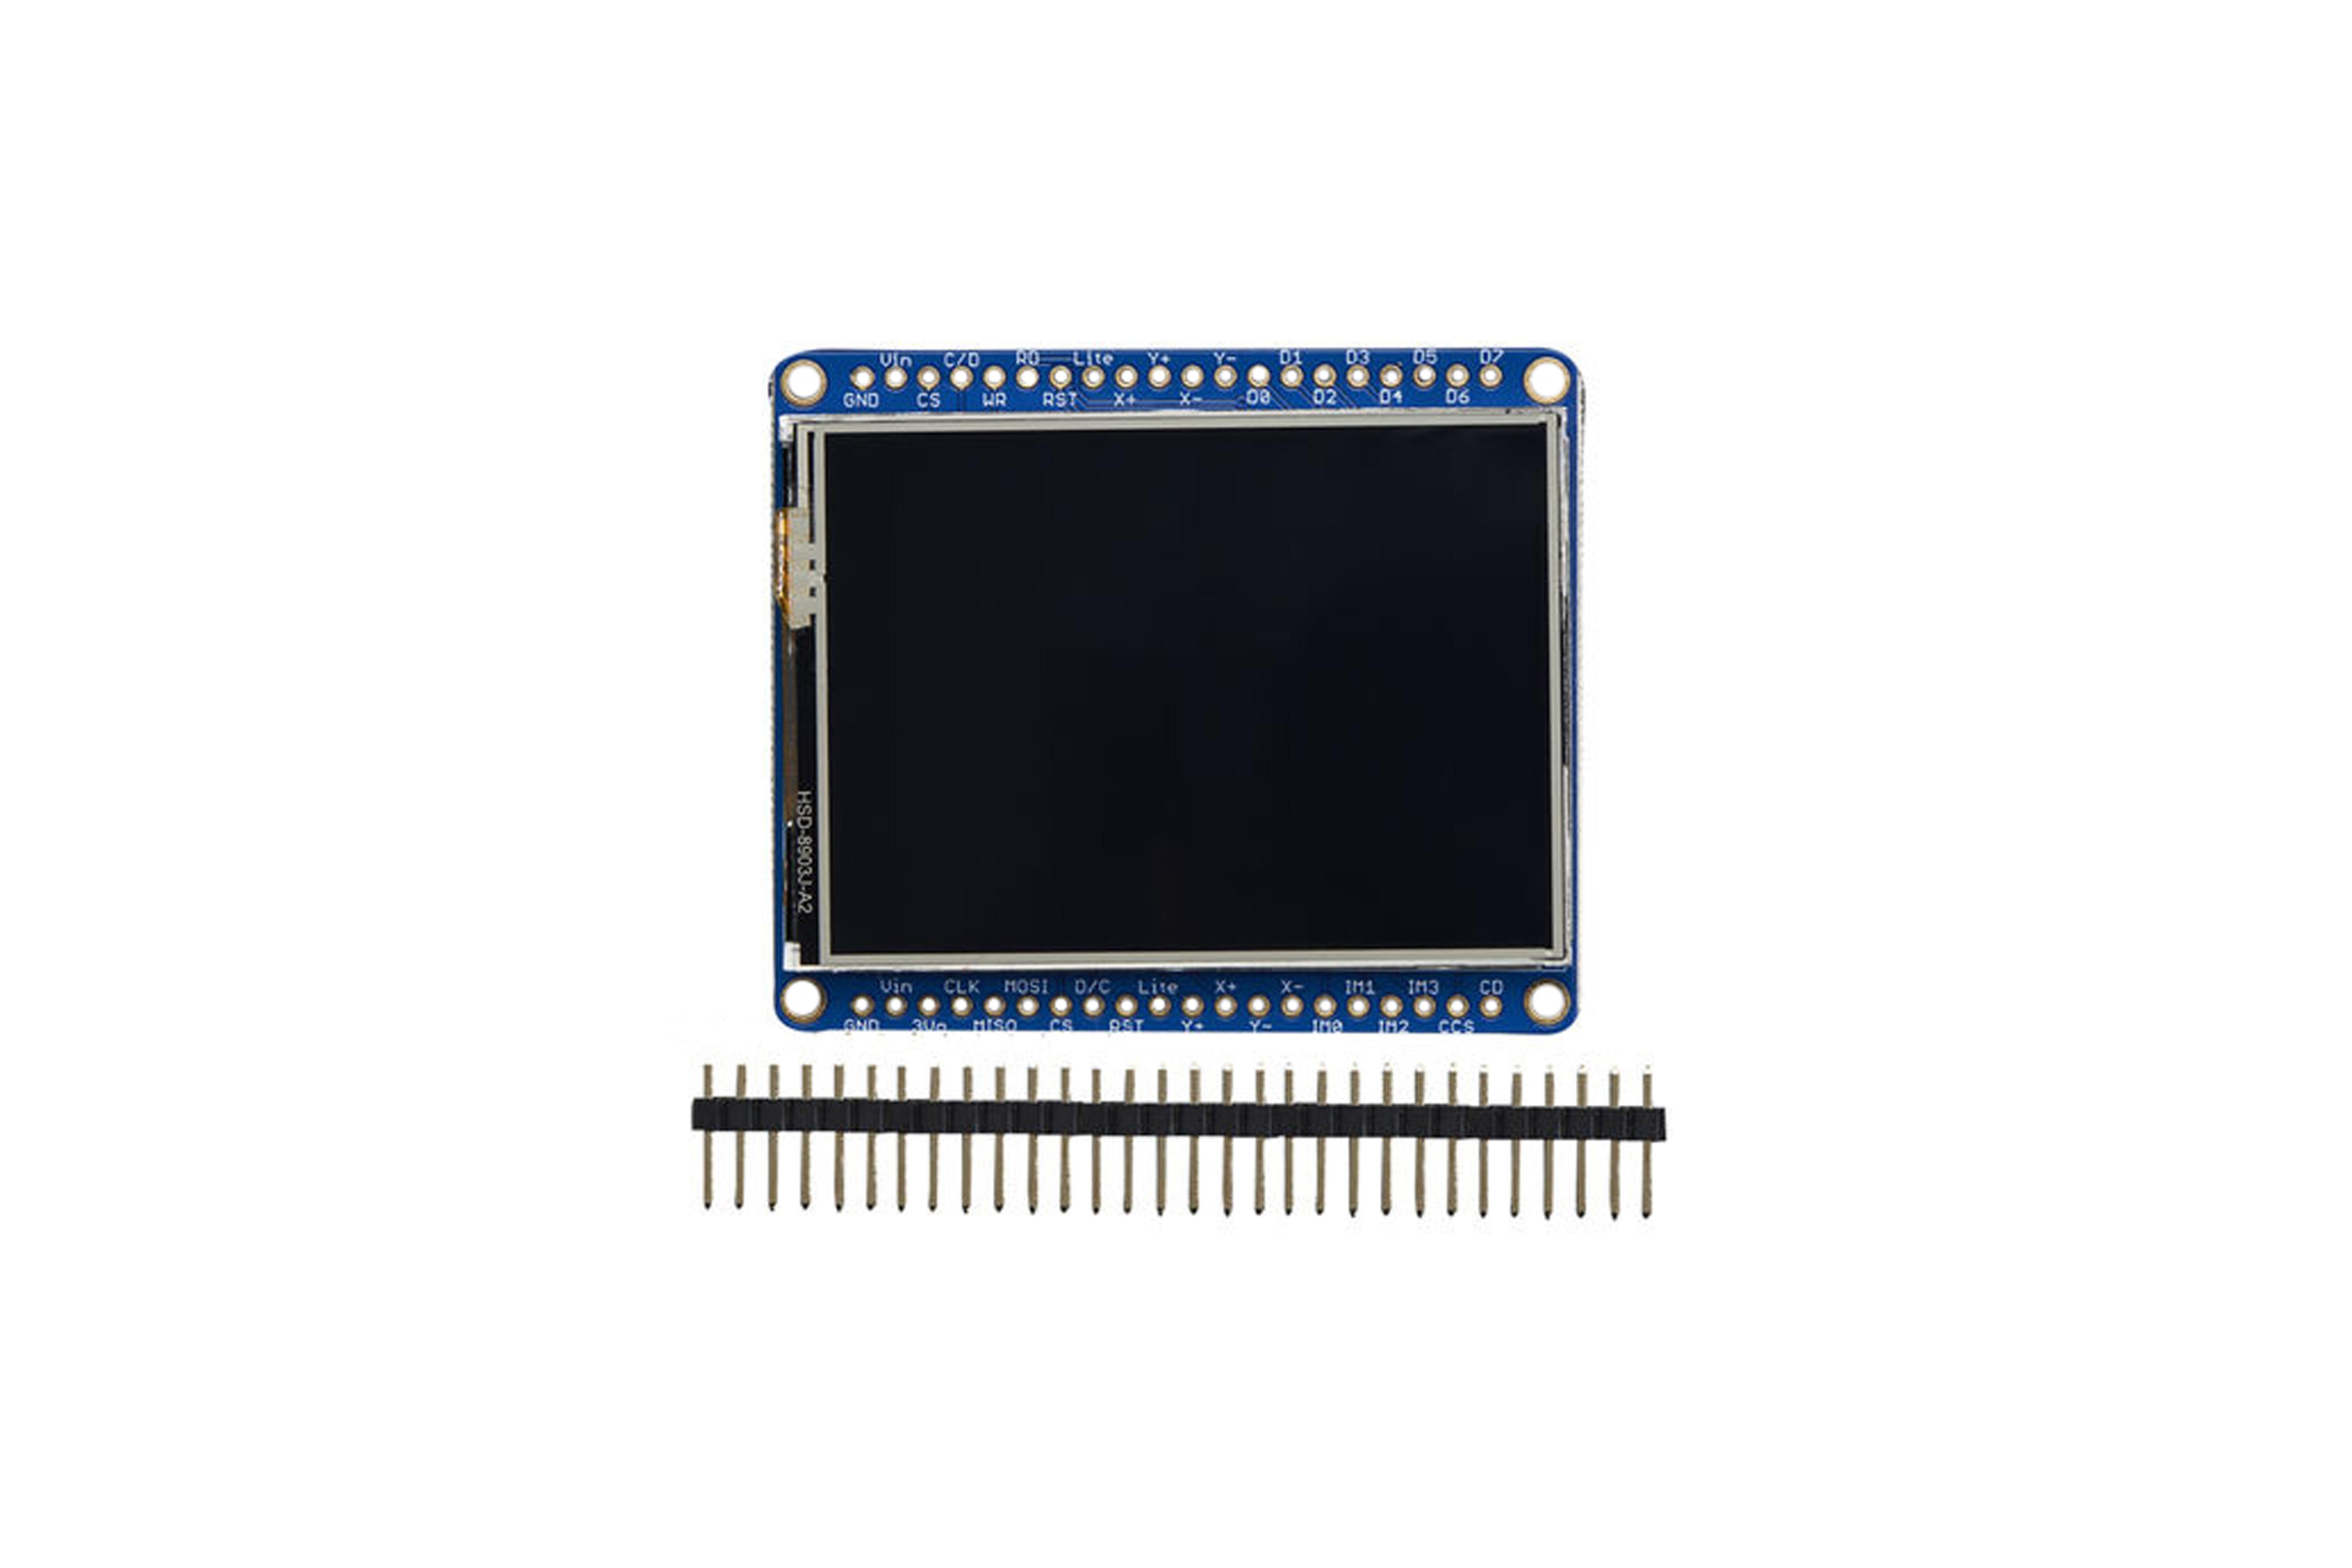 Adafruit(アダフルーツ)2.4インチLCD タッチスクリーンボード